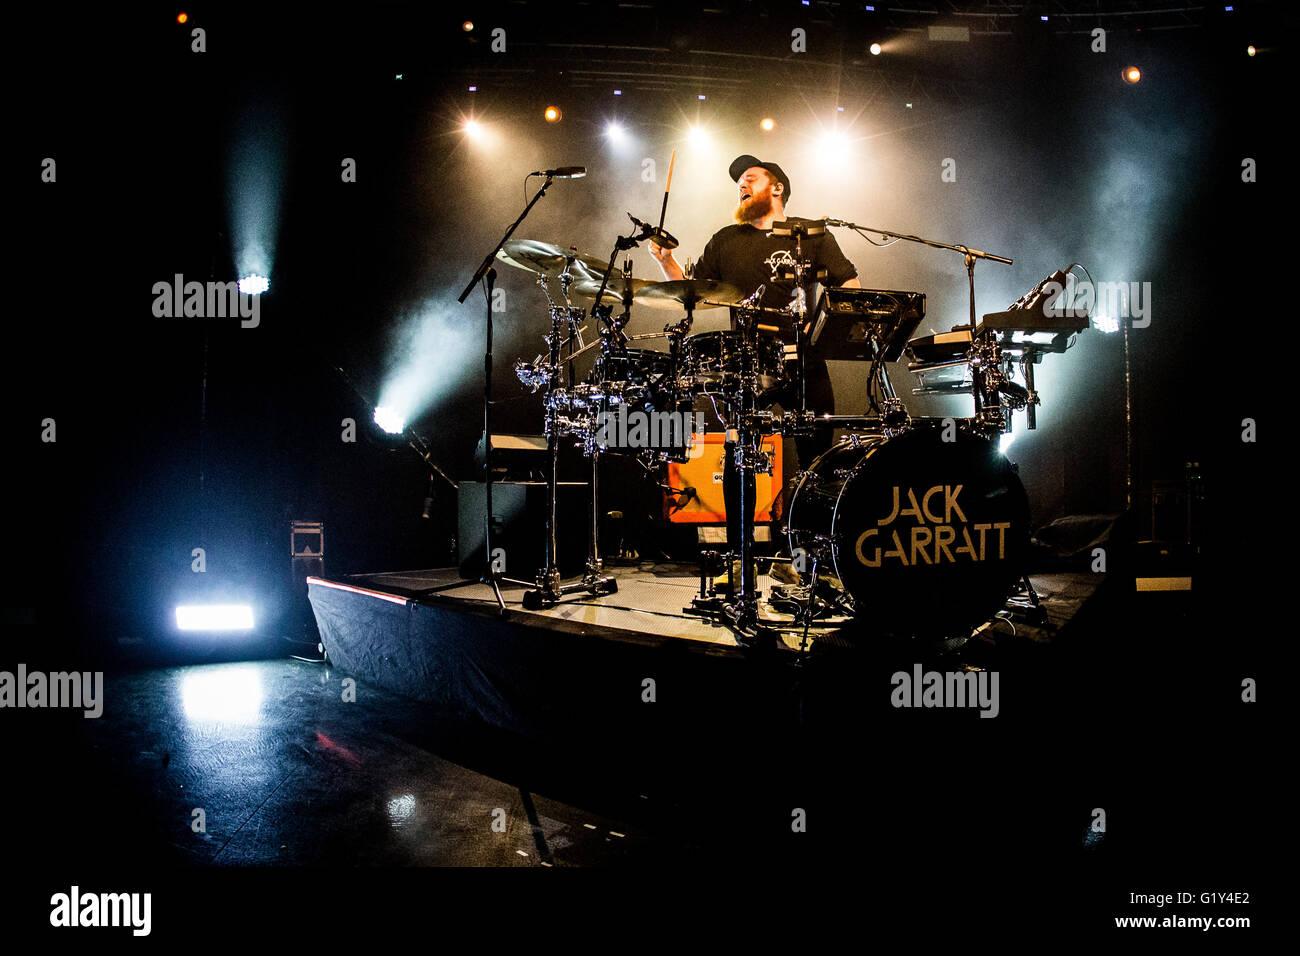 Mailand, Italien 20. Mai 2016 Jack Garratt live bei Fabrique in Mailand Credit: Roberto Finizio / Alamy Live News Stockbild